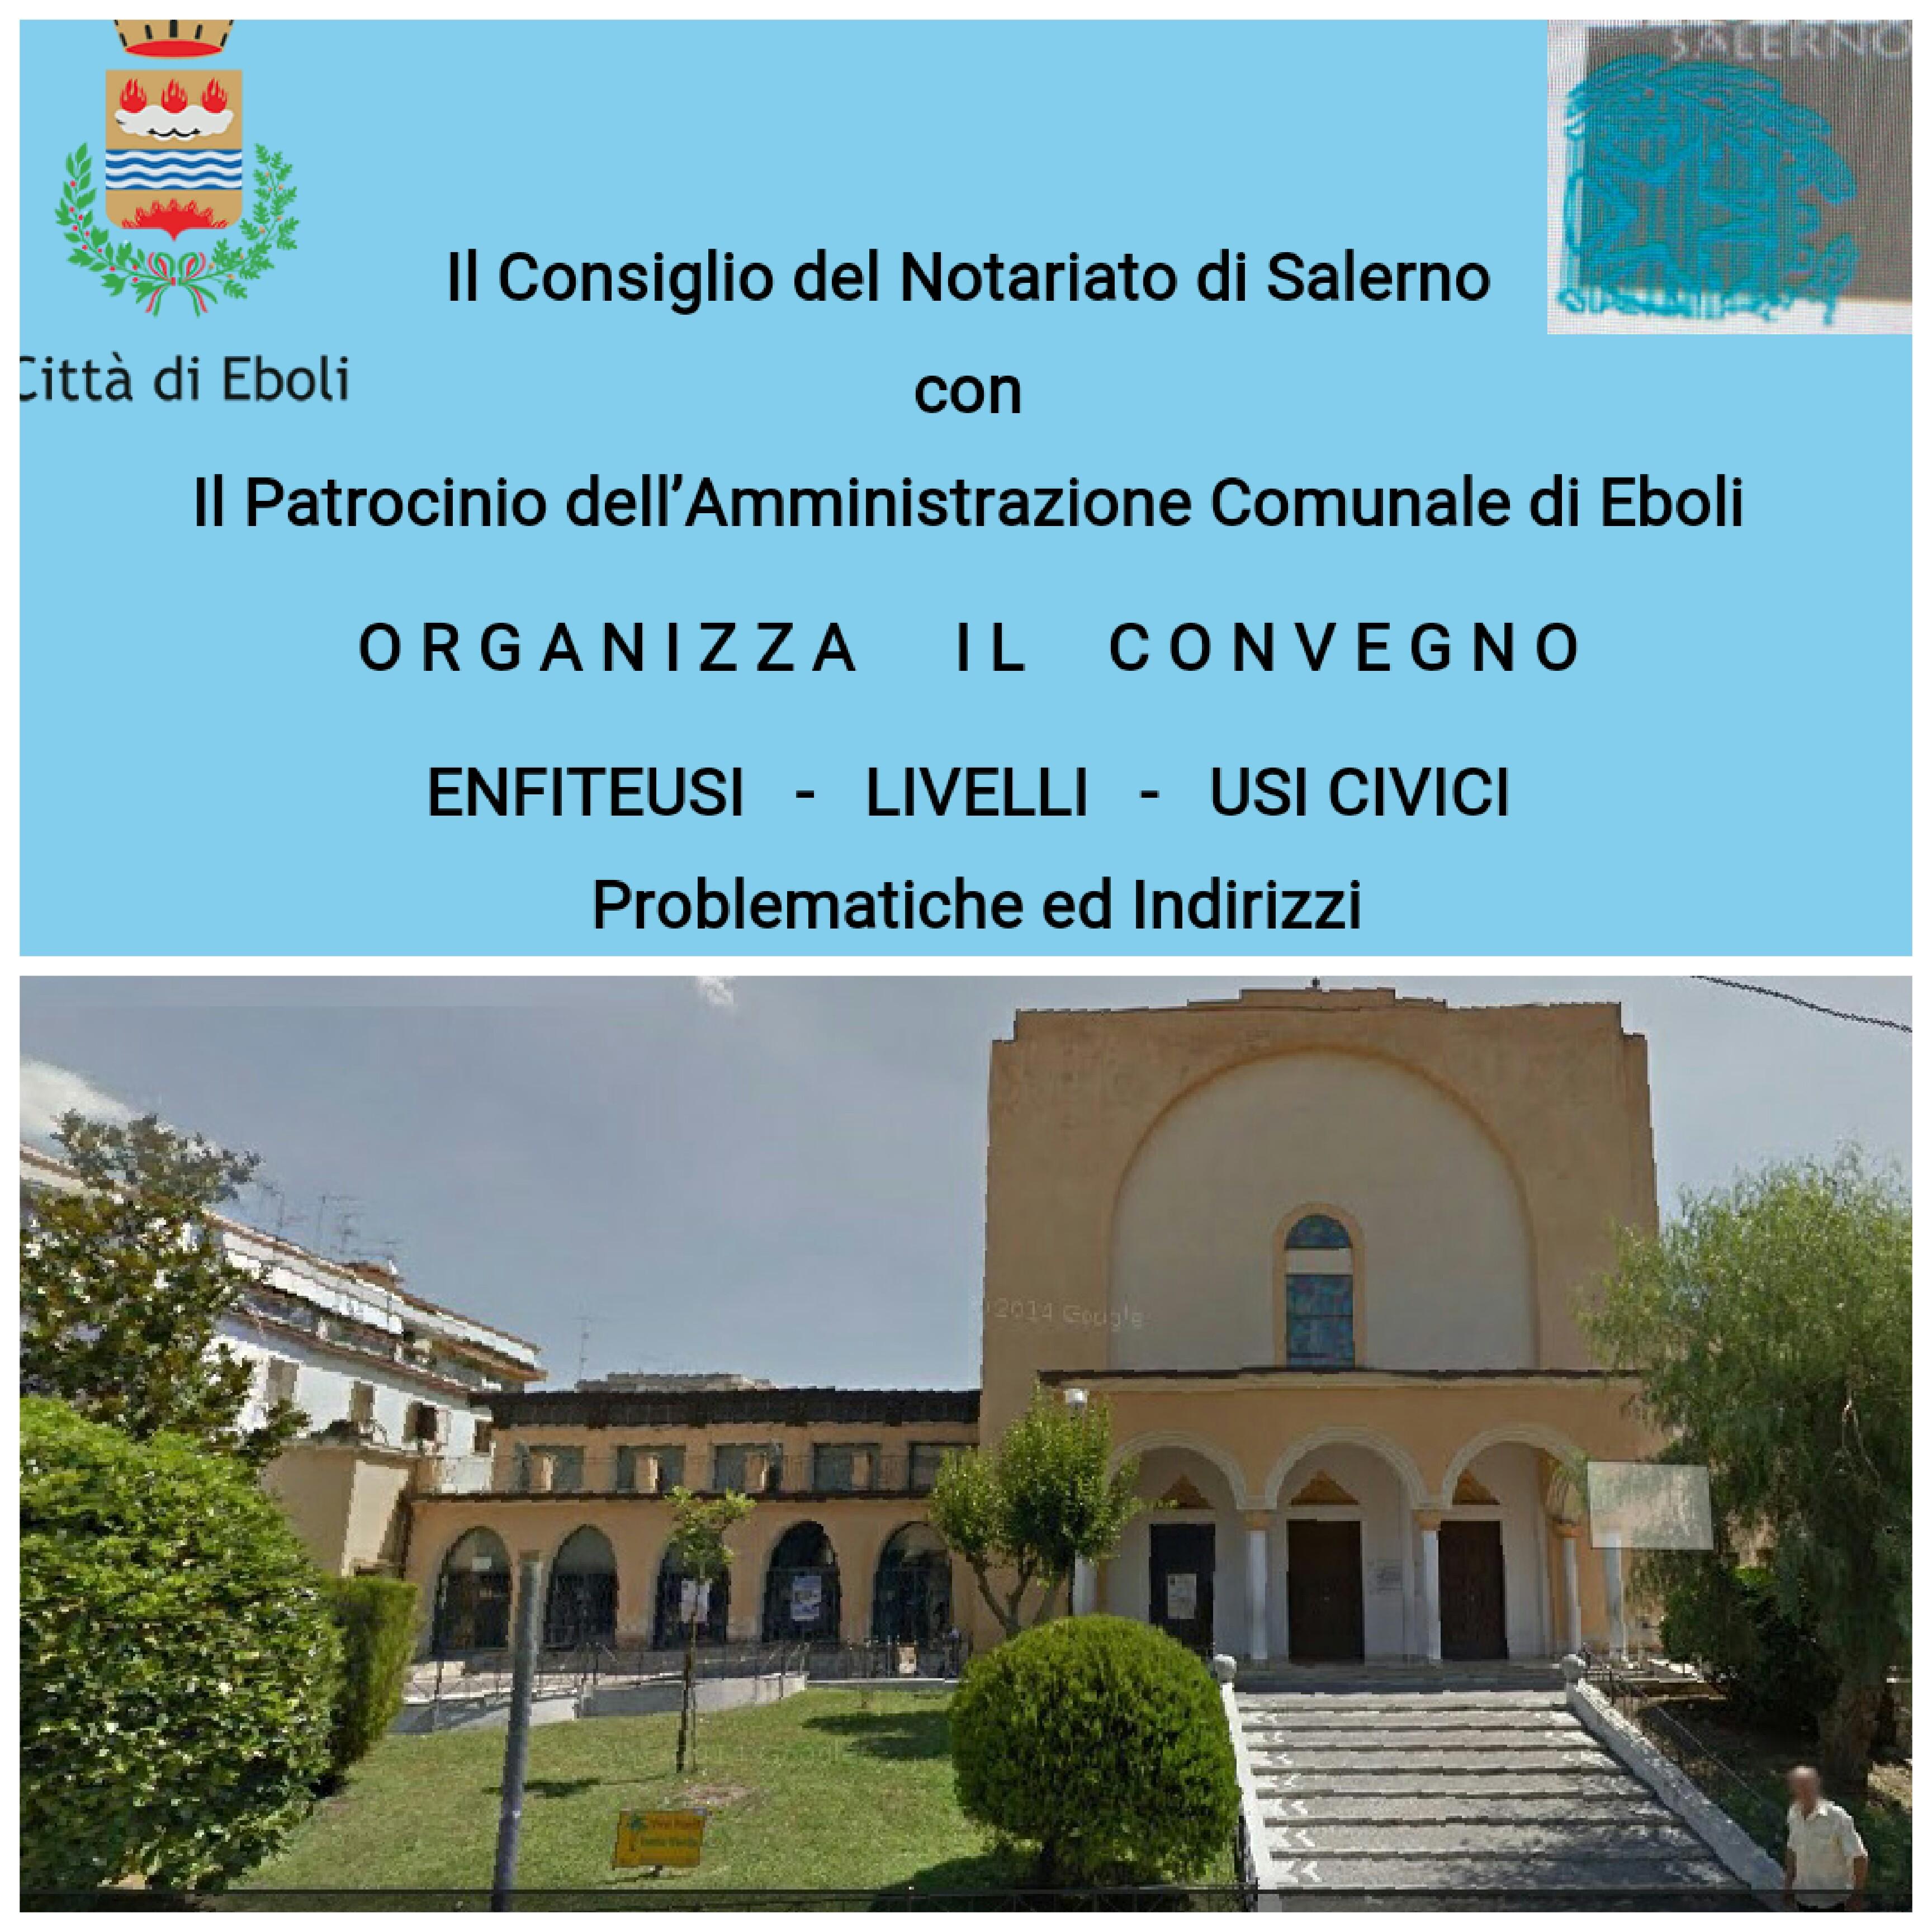 Auditorium San Bartolomeo Eboli-Convegno enfiteusi